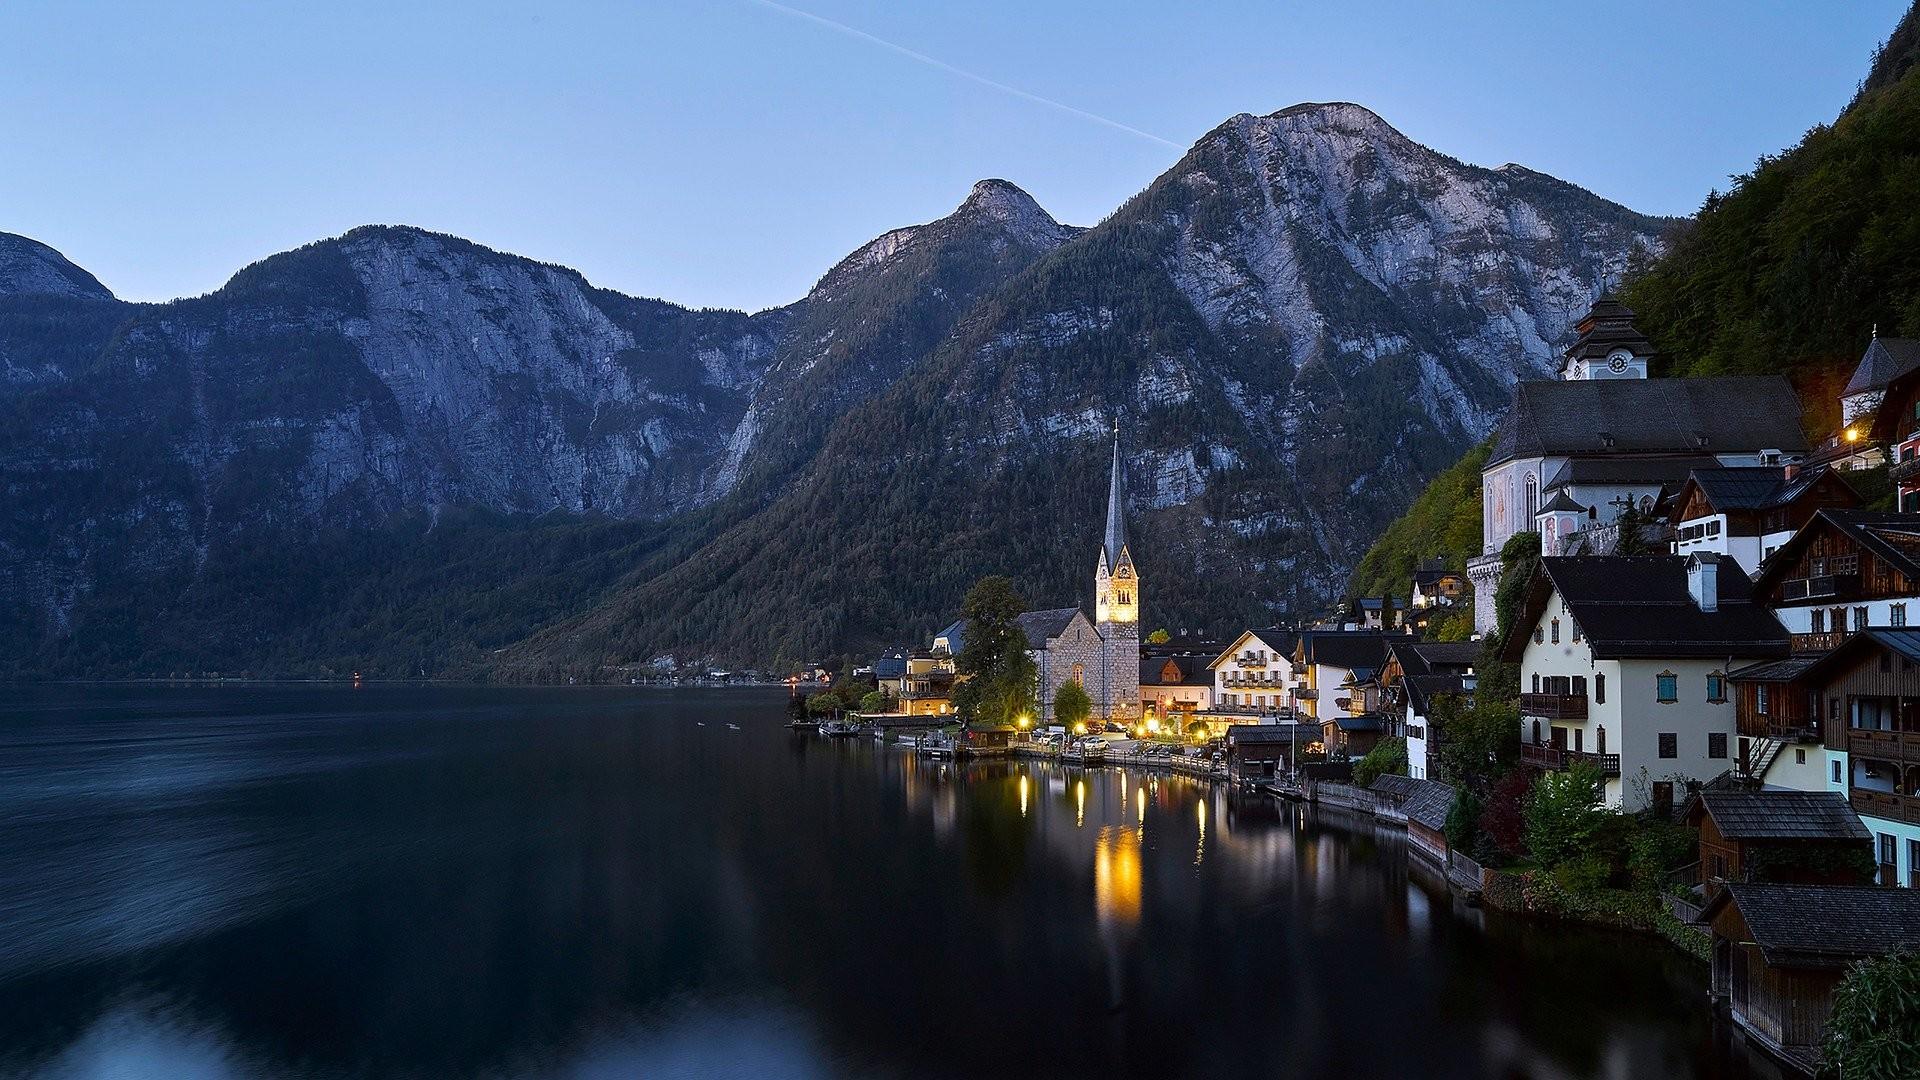 Hallstatt in Austria - Foto di Vined da Pixabay